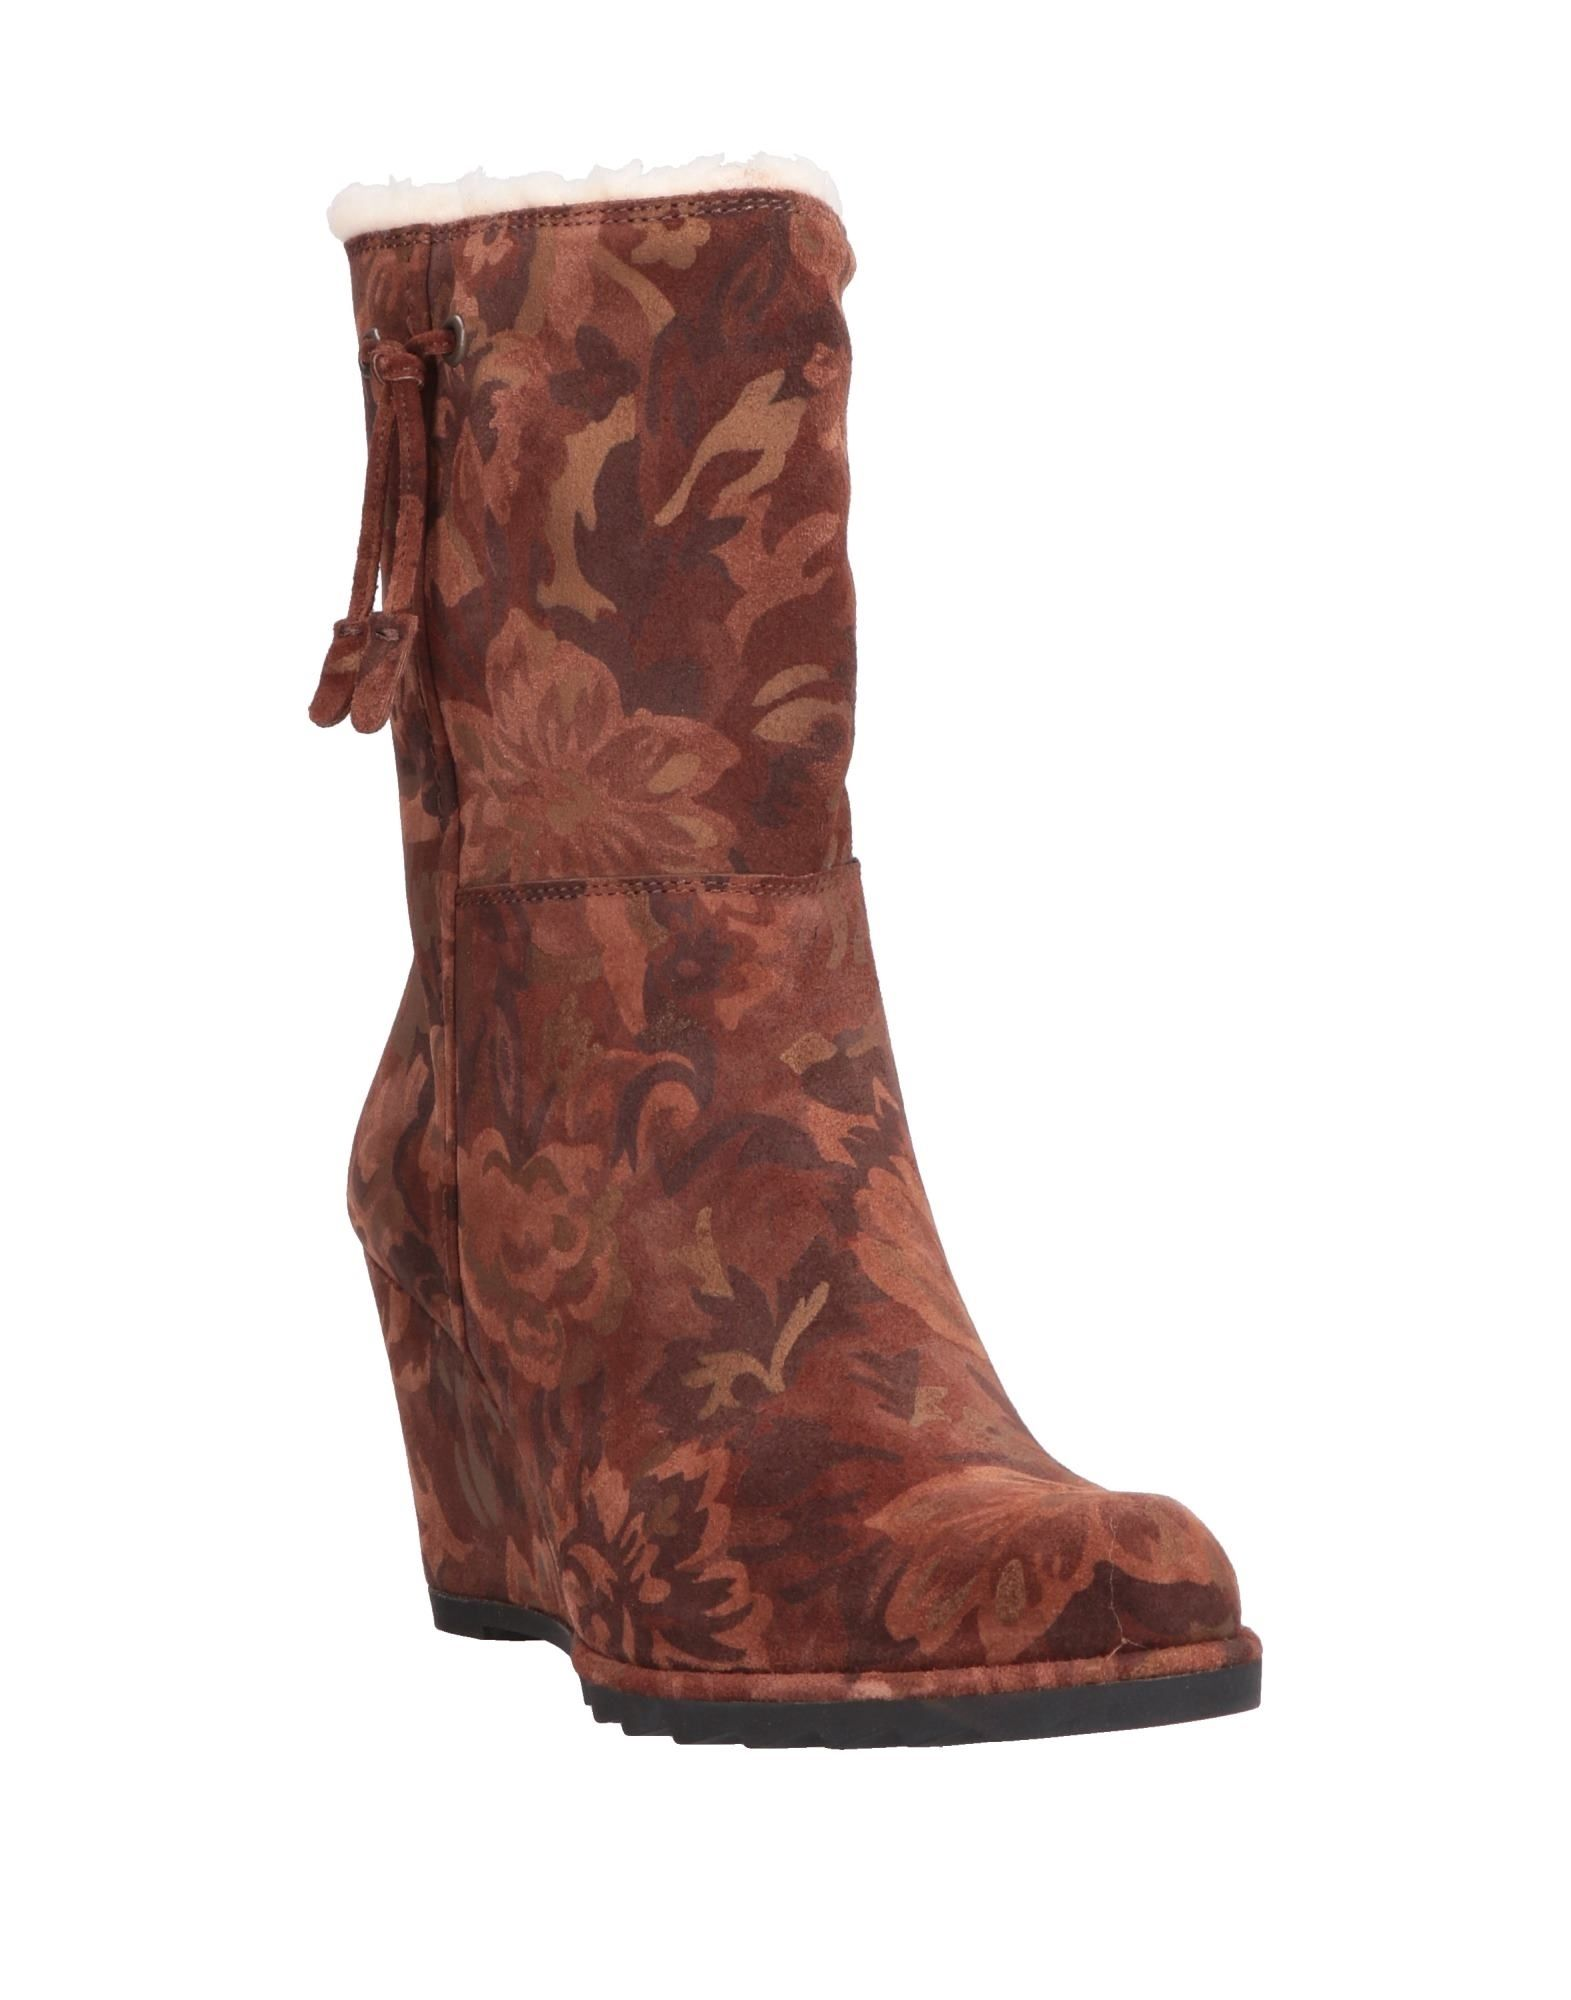 Stilvolle billige Schuhe Damen Pons Quintana Stiefelette Damen Schuhe  11555934AG 2e0c79